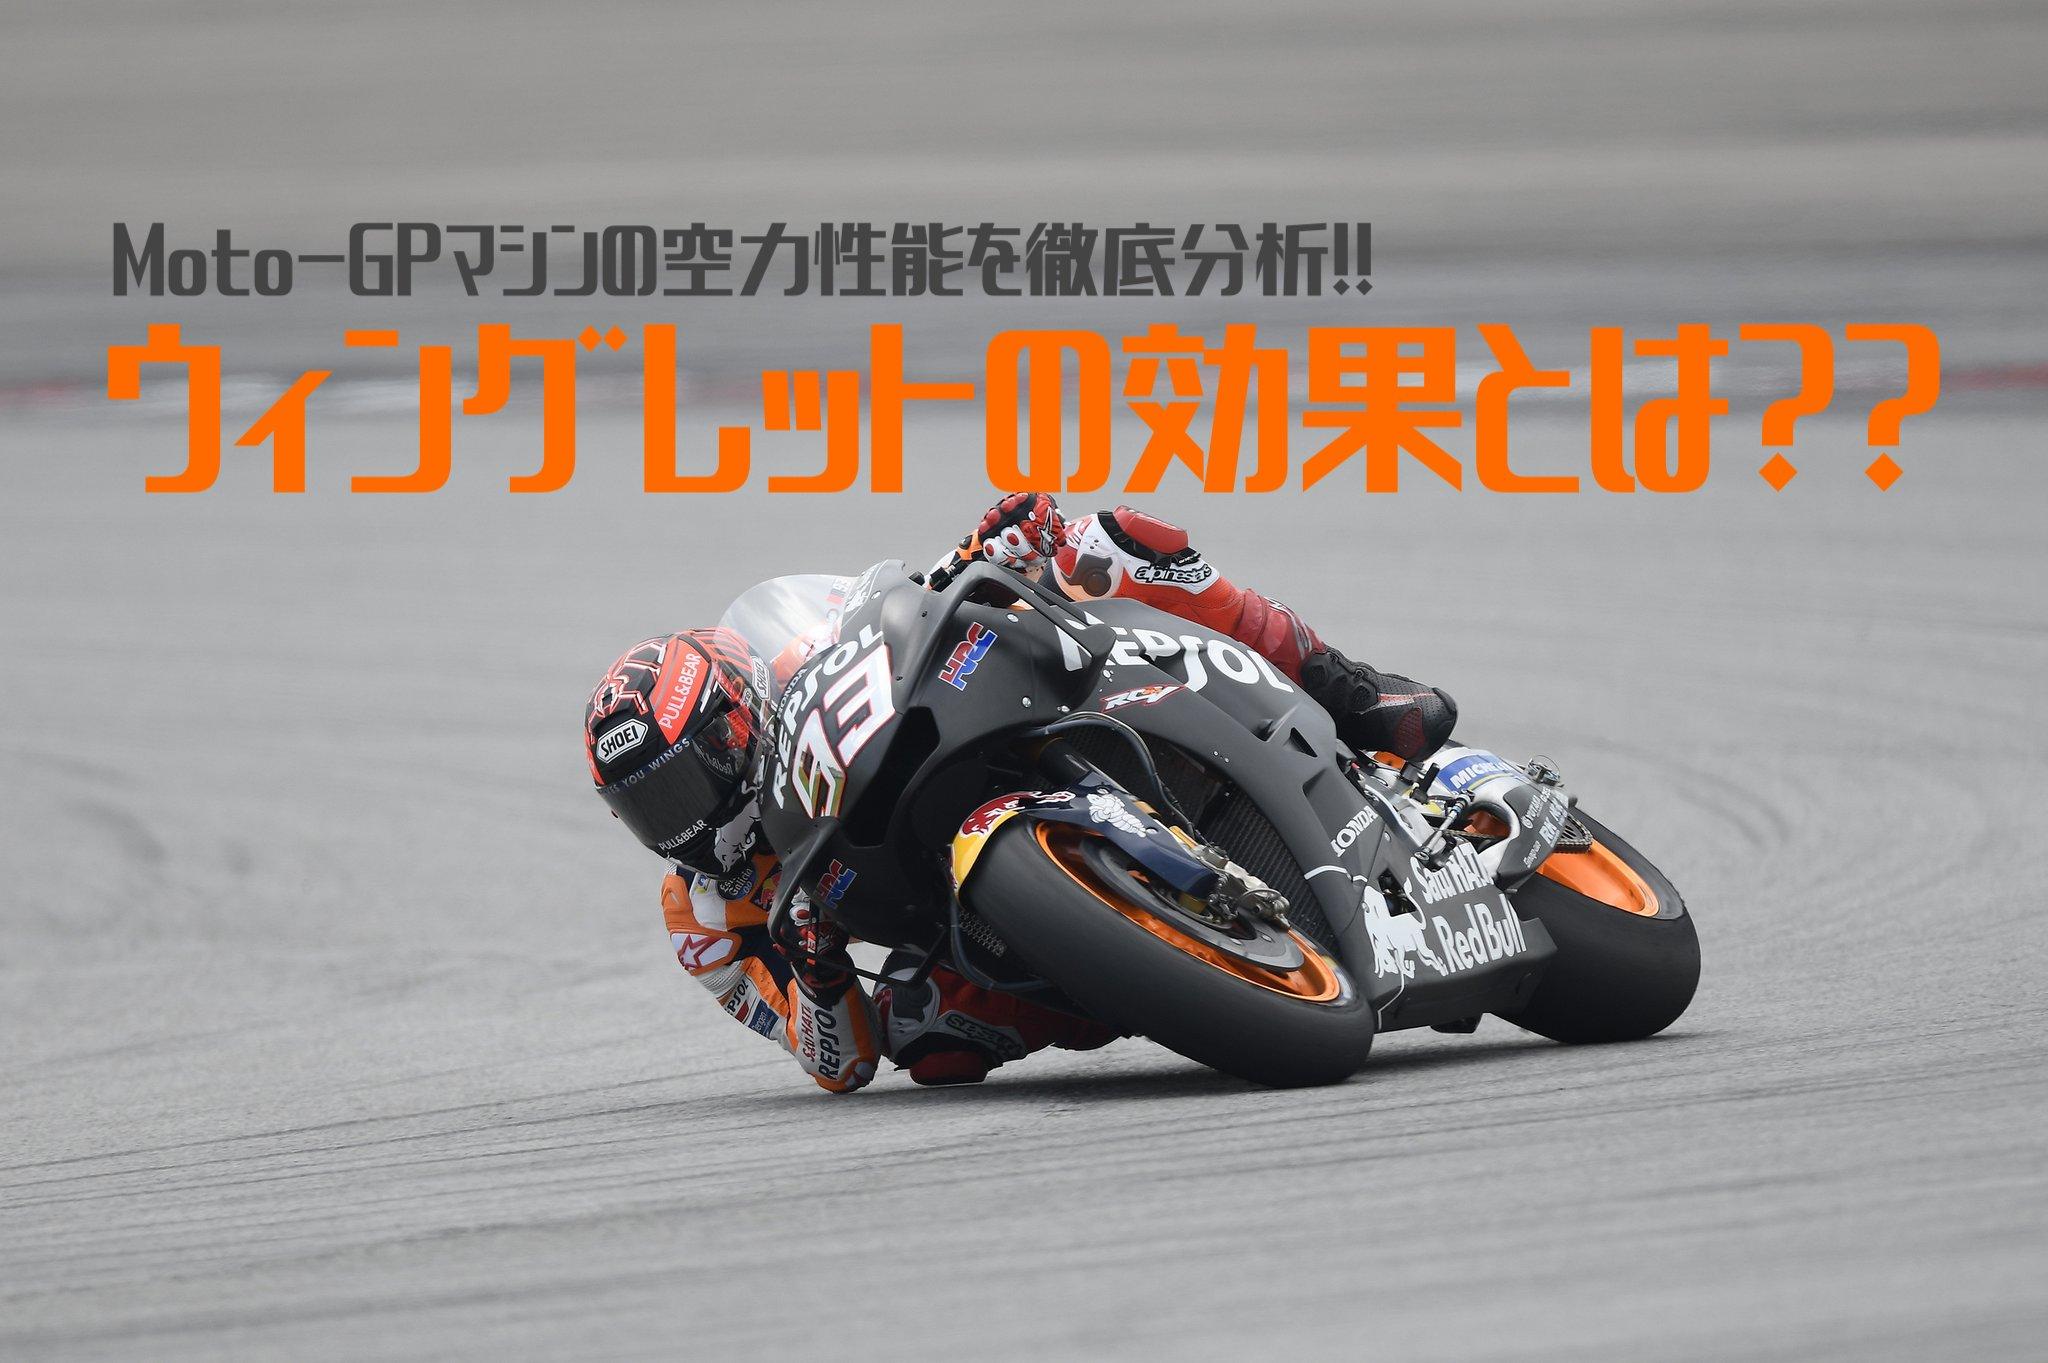 MotoGPマシンの空力性能を徹底分析!!ウィングレットの効果とは?